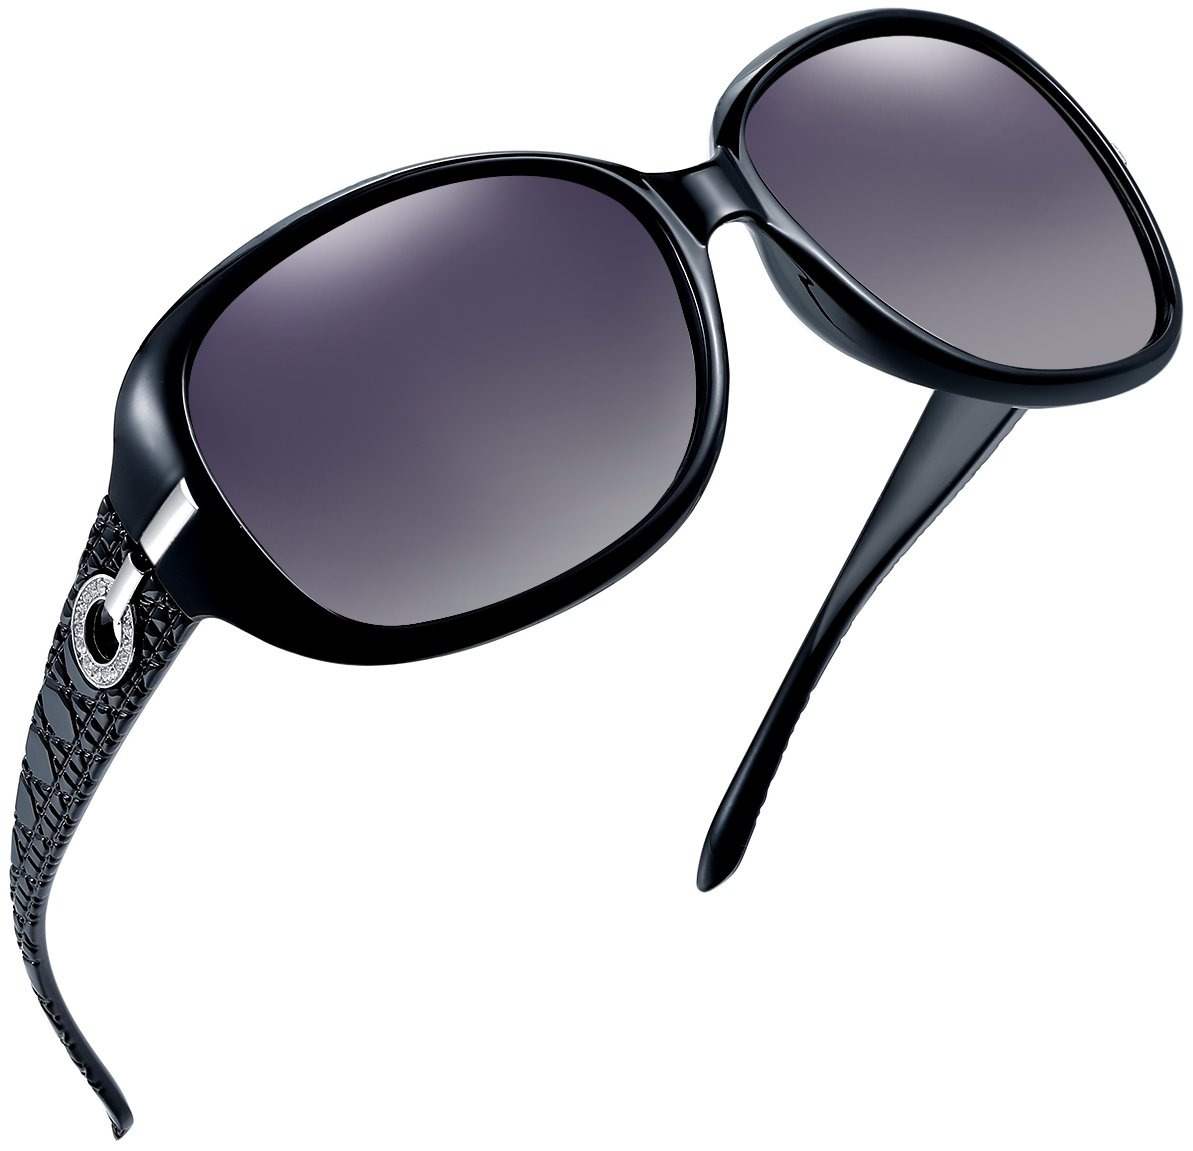 84674b791 Joopin Mujer Gafas De Sol Polarizadas Mujer Mariposa Gran - S/ 129 ...